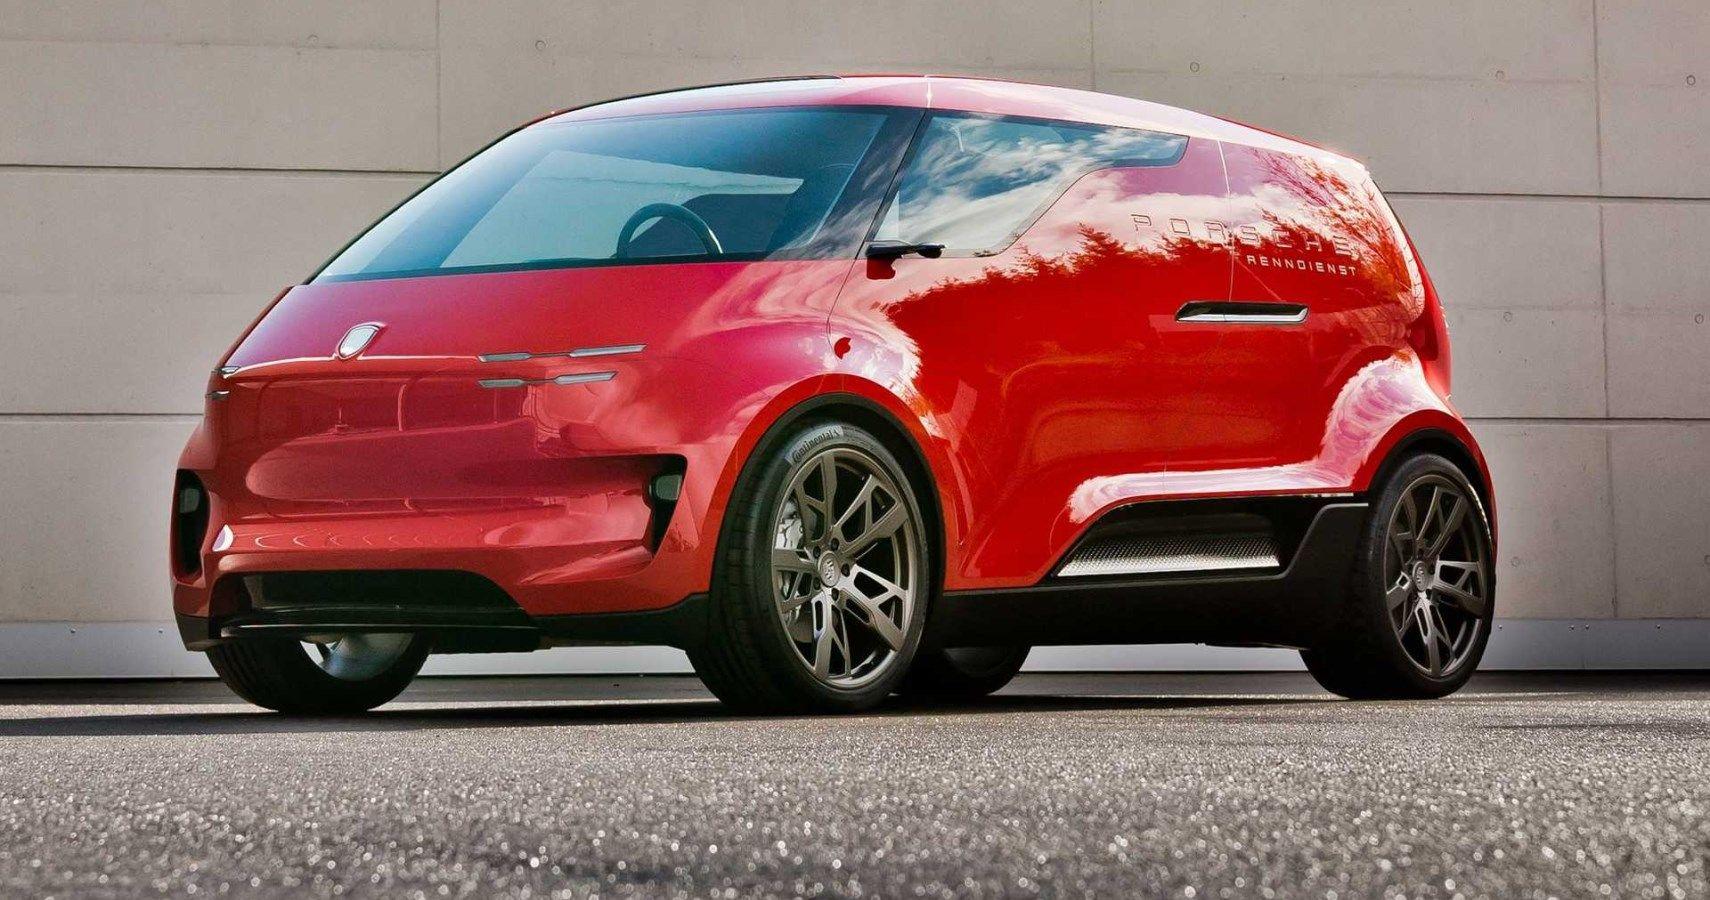 Porsche Lifts The Cover Off Top Secret Minivan Concept | HotCars